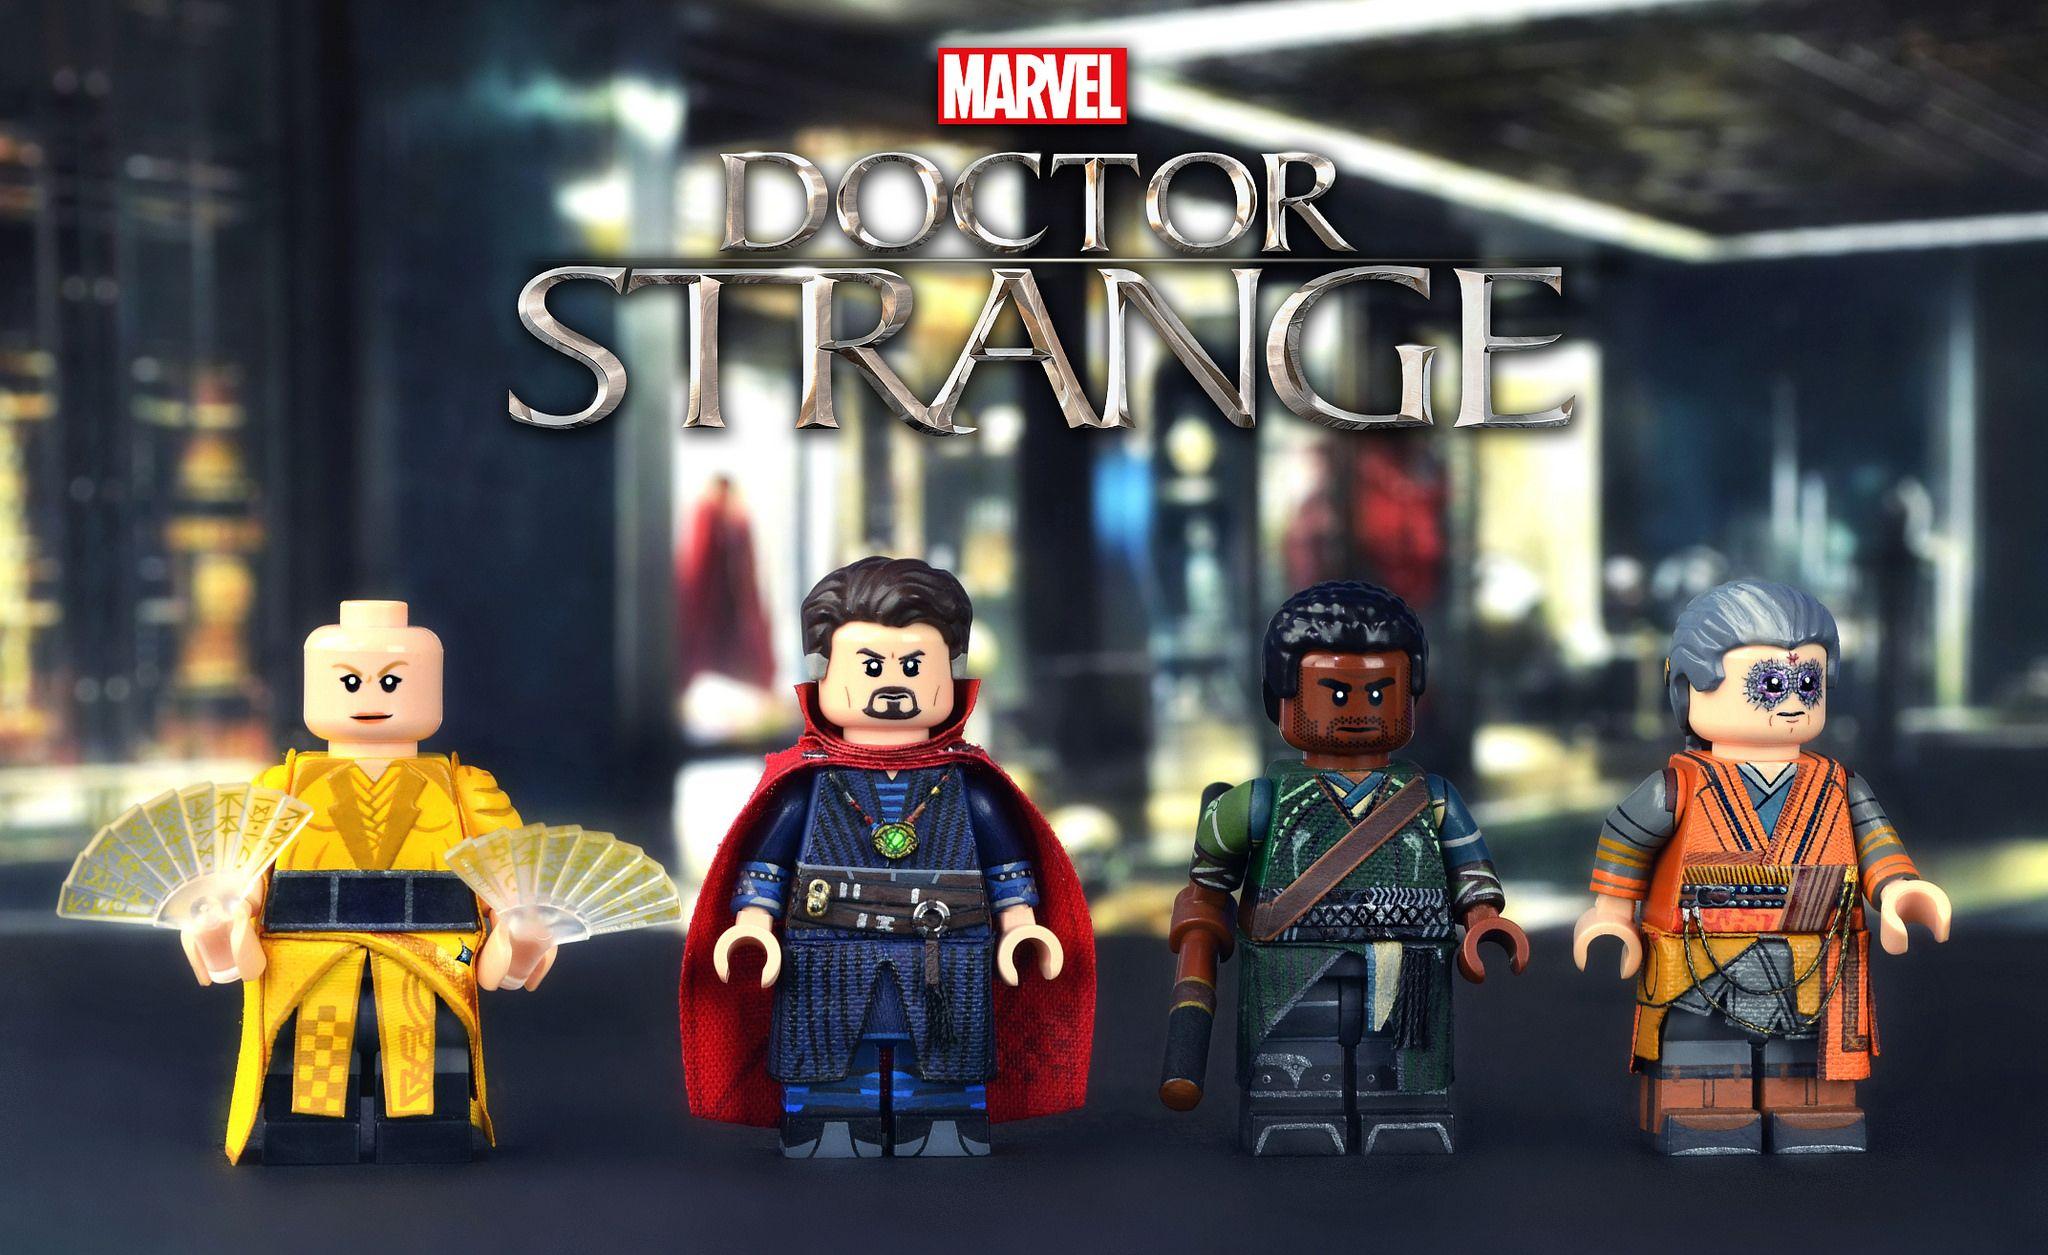 LEGO Marvel : Doctor Strange Minifigures